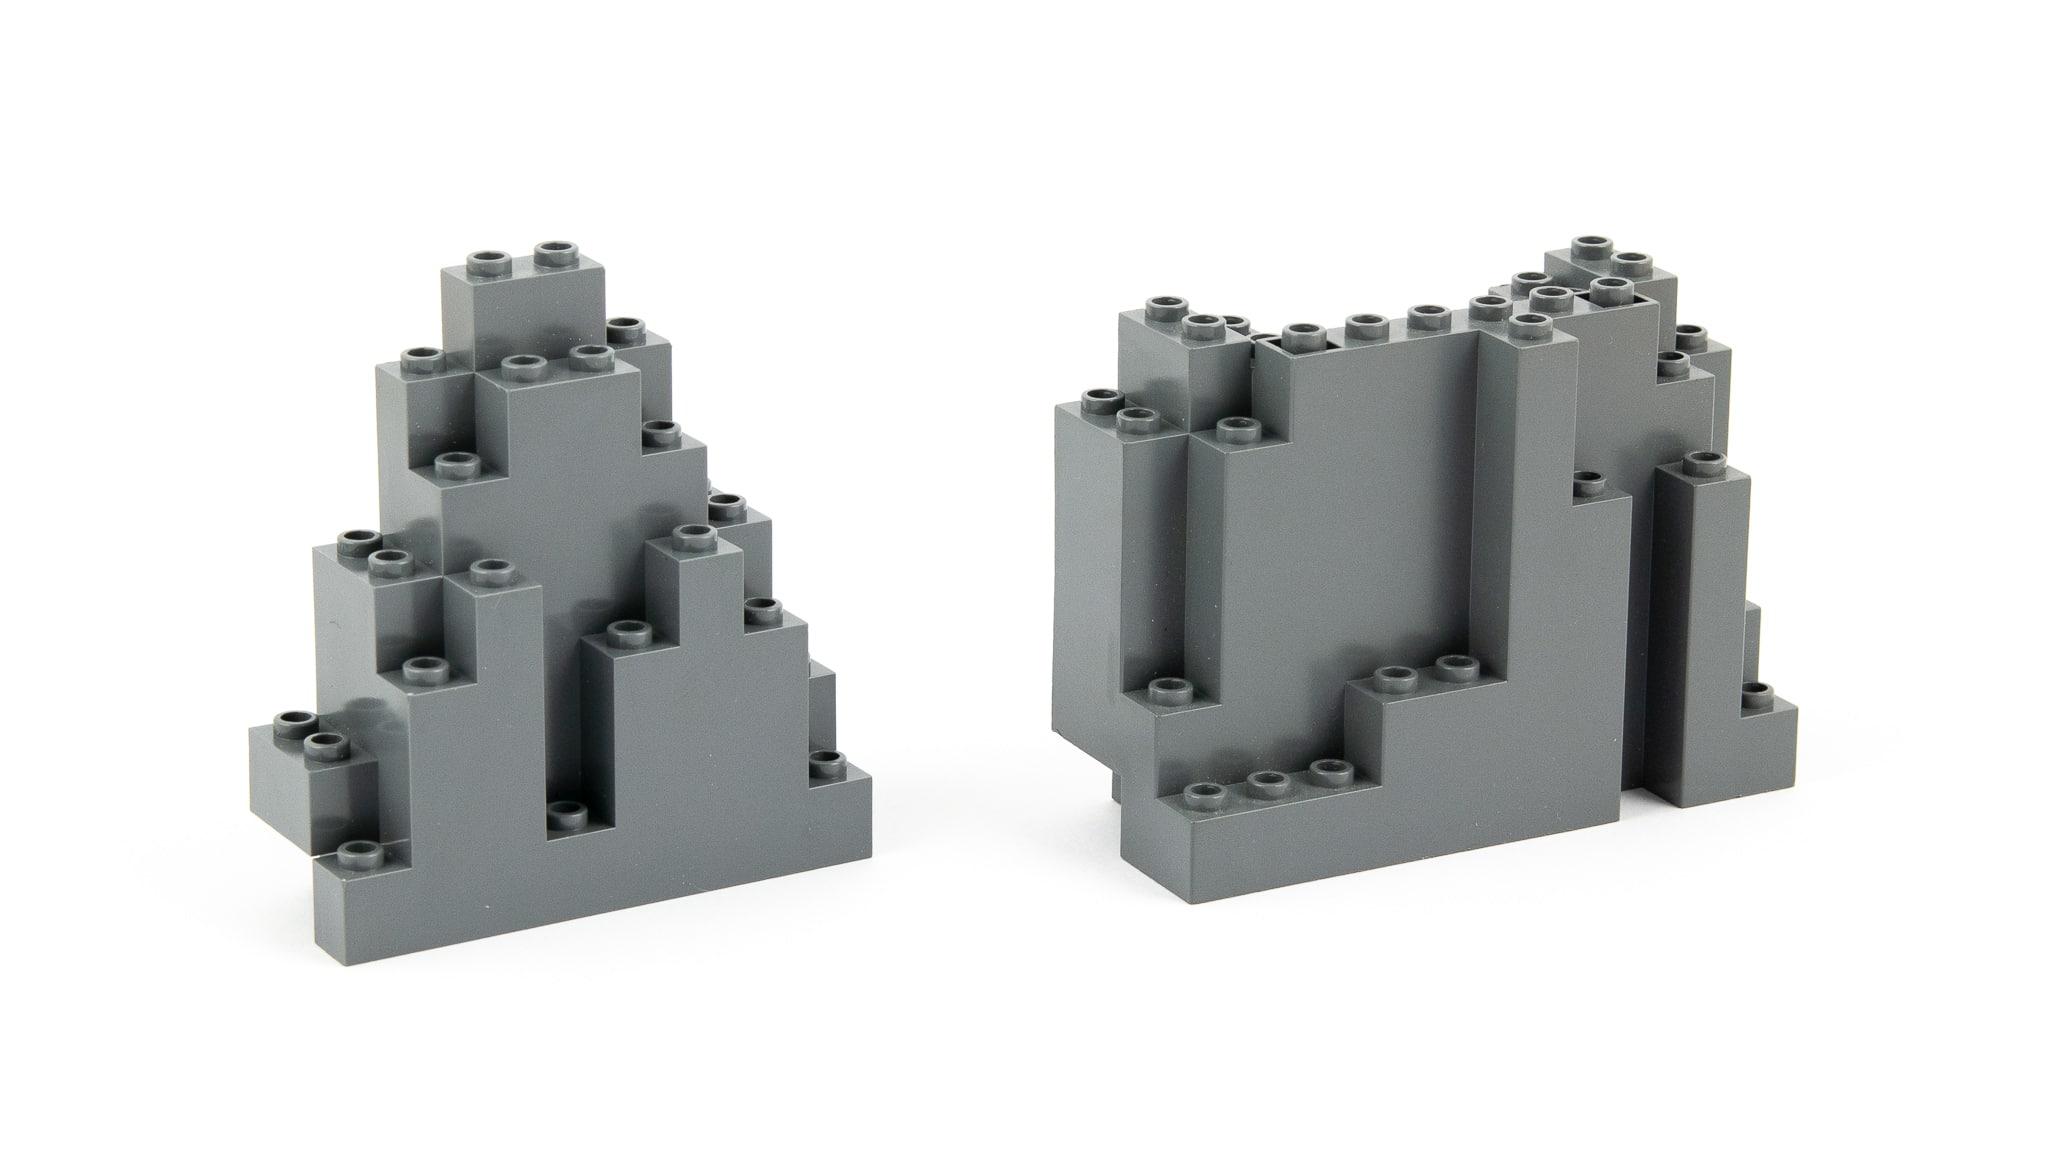 LEGO Steine Namen Burp Lurp